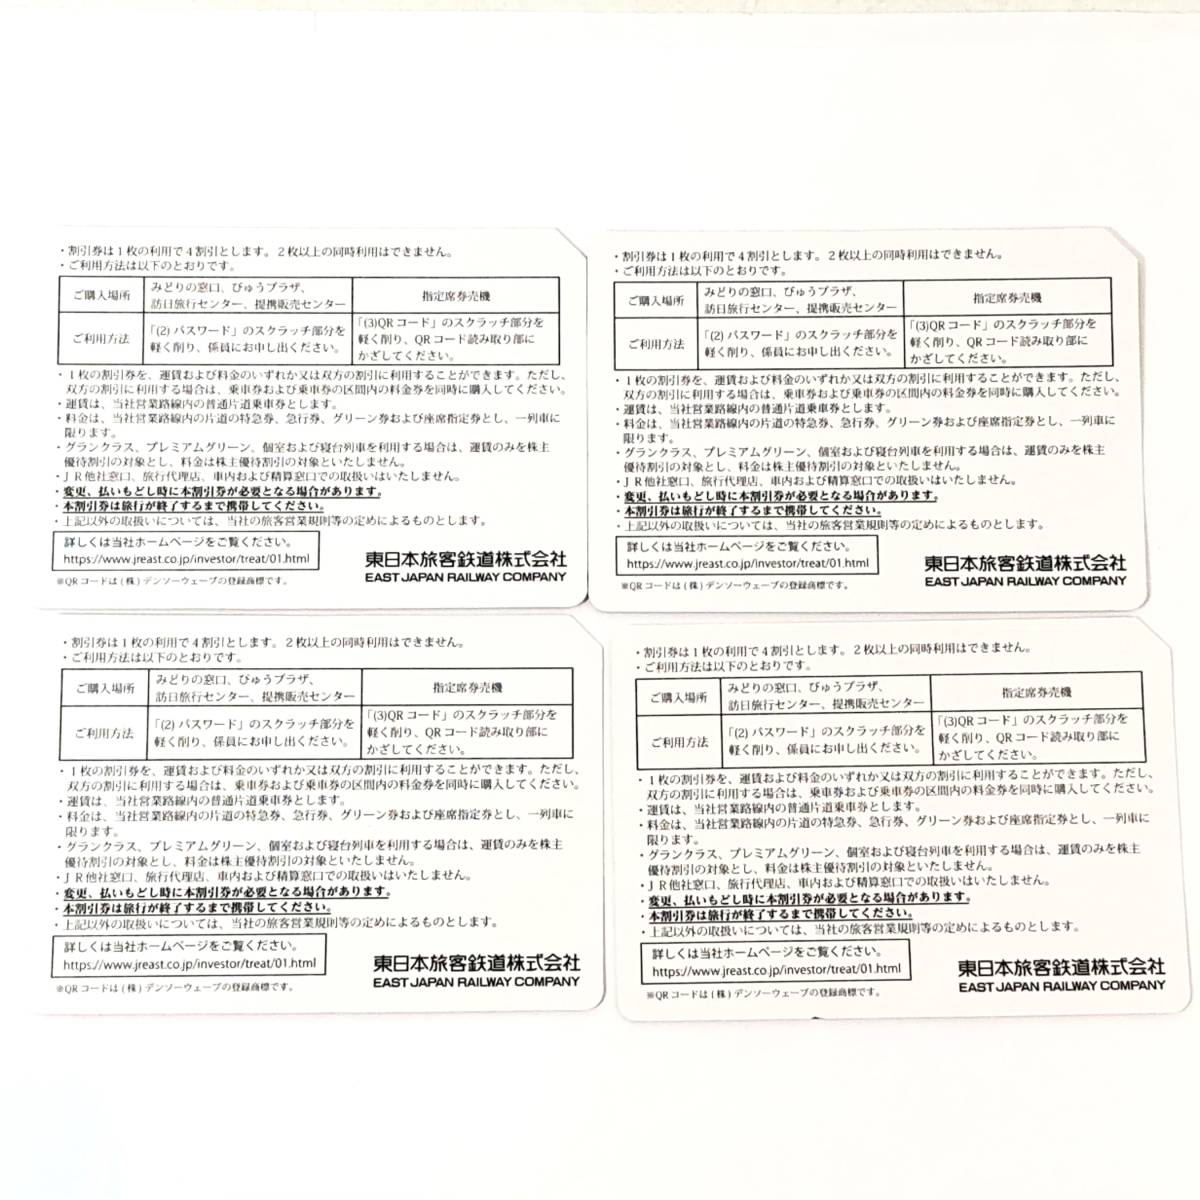 ▼【送料無料】JR東日本 株主優待割引券 4枚セット 東日本旅客鉄道 2021年6月1日~2022年5月31日まで有効_画像3